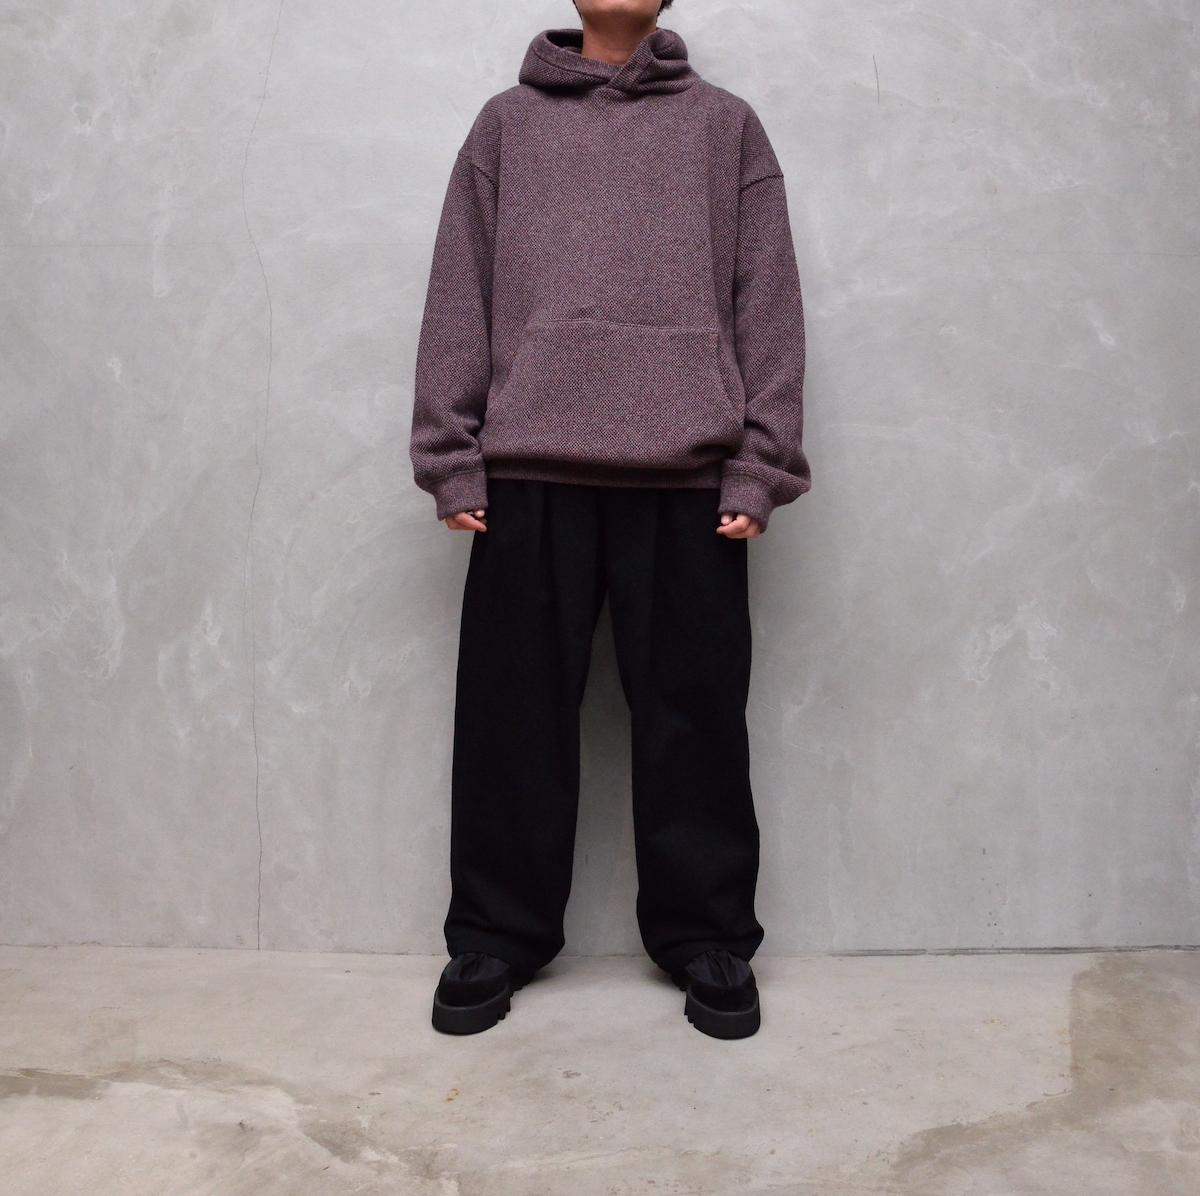 crepuscule 「 Moss stitch hoodie / Burgundy 」